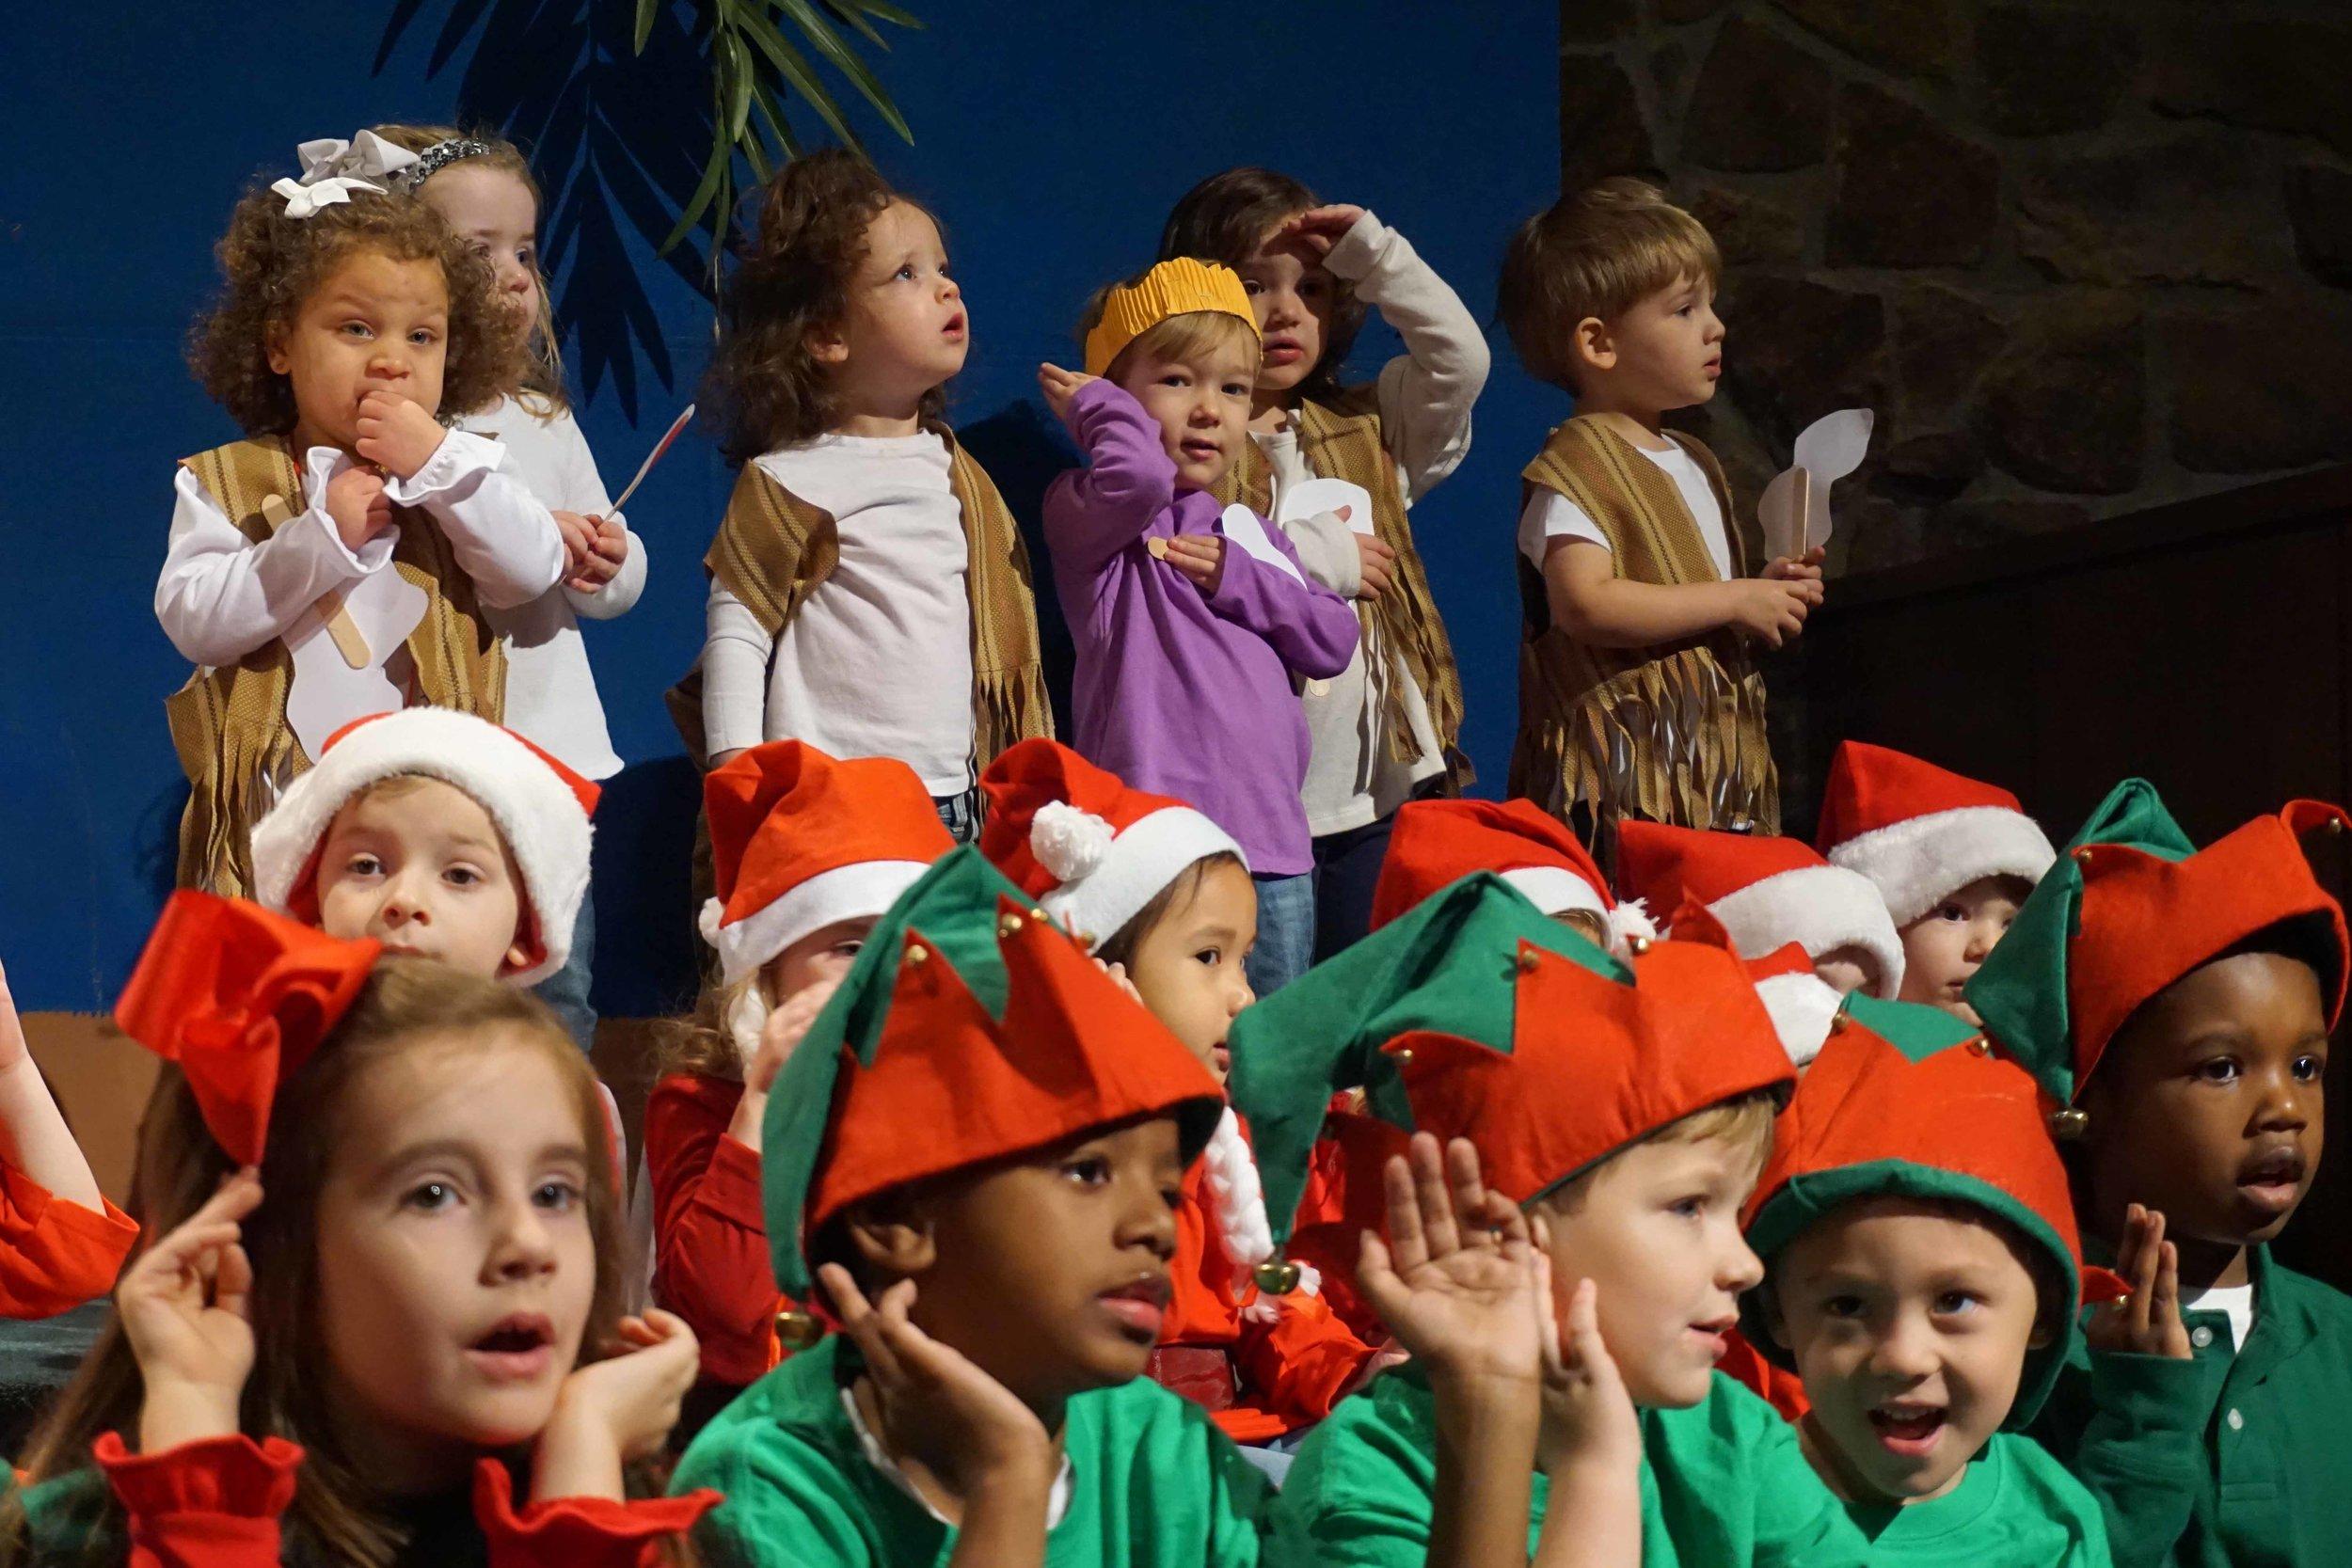 Dec13 WSLH ChristmasProgramTinyTravelers&HappyCamp59.jpg